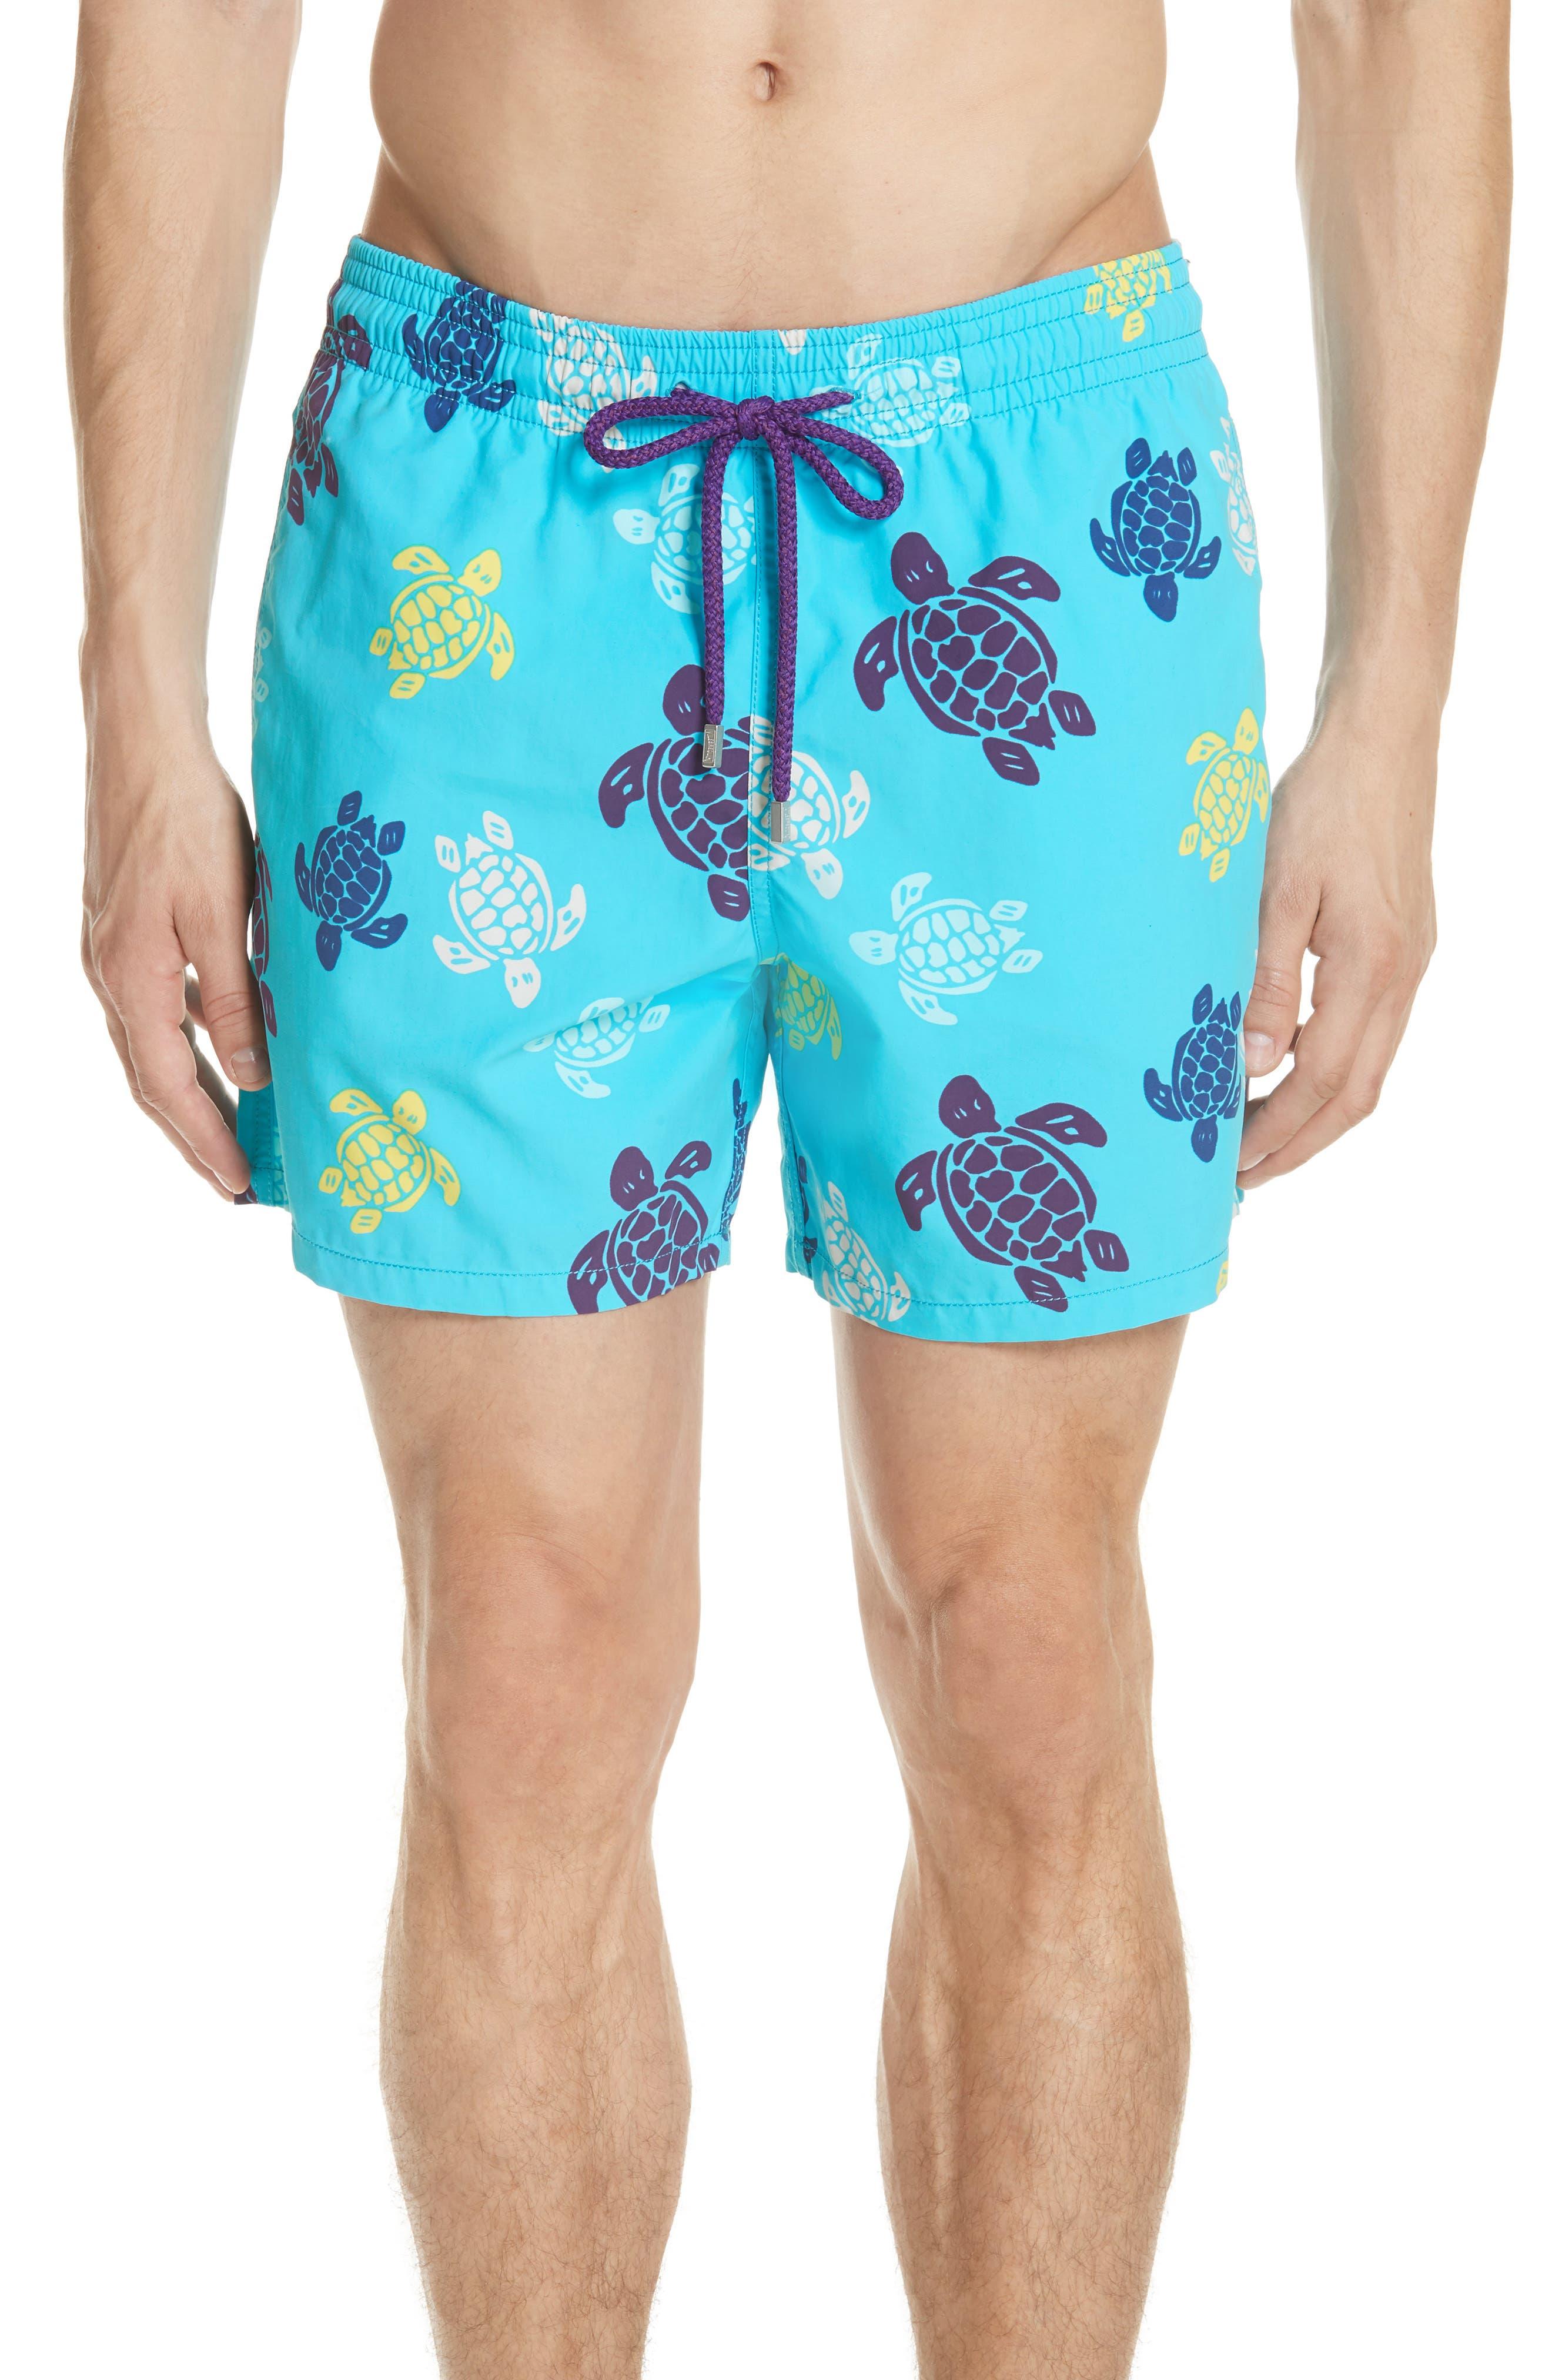 VILEBREQUIN Multicolor Turtle Print Swim Trunks, Main, color, 432